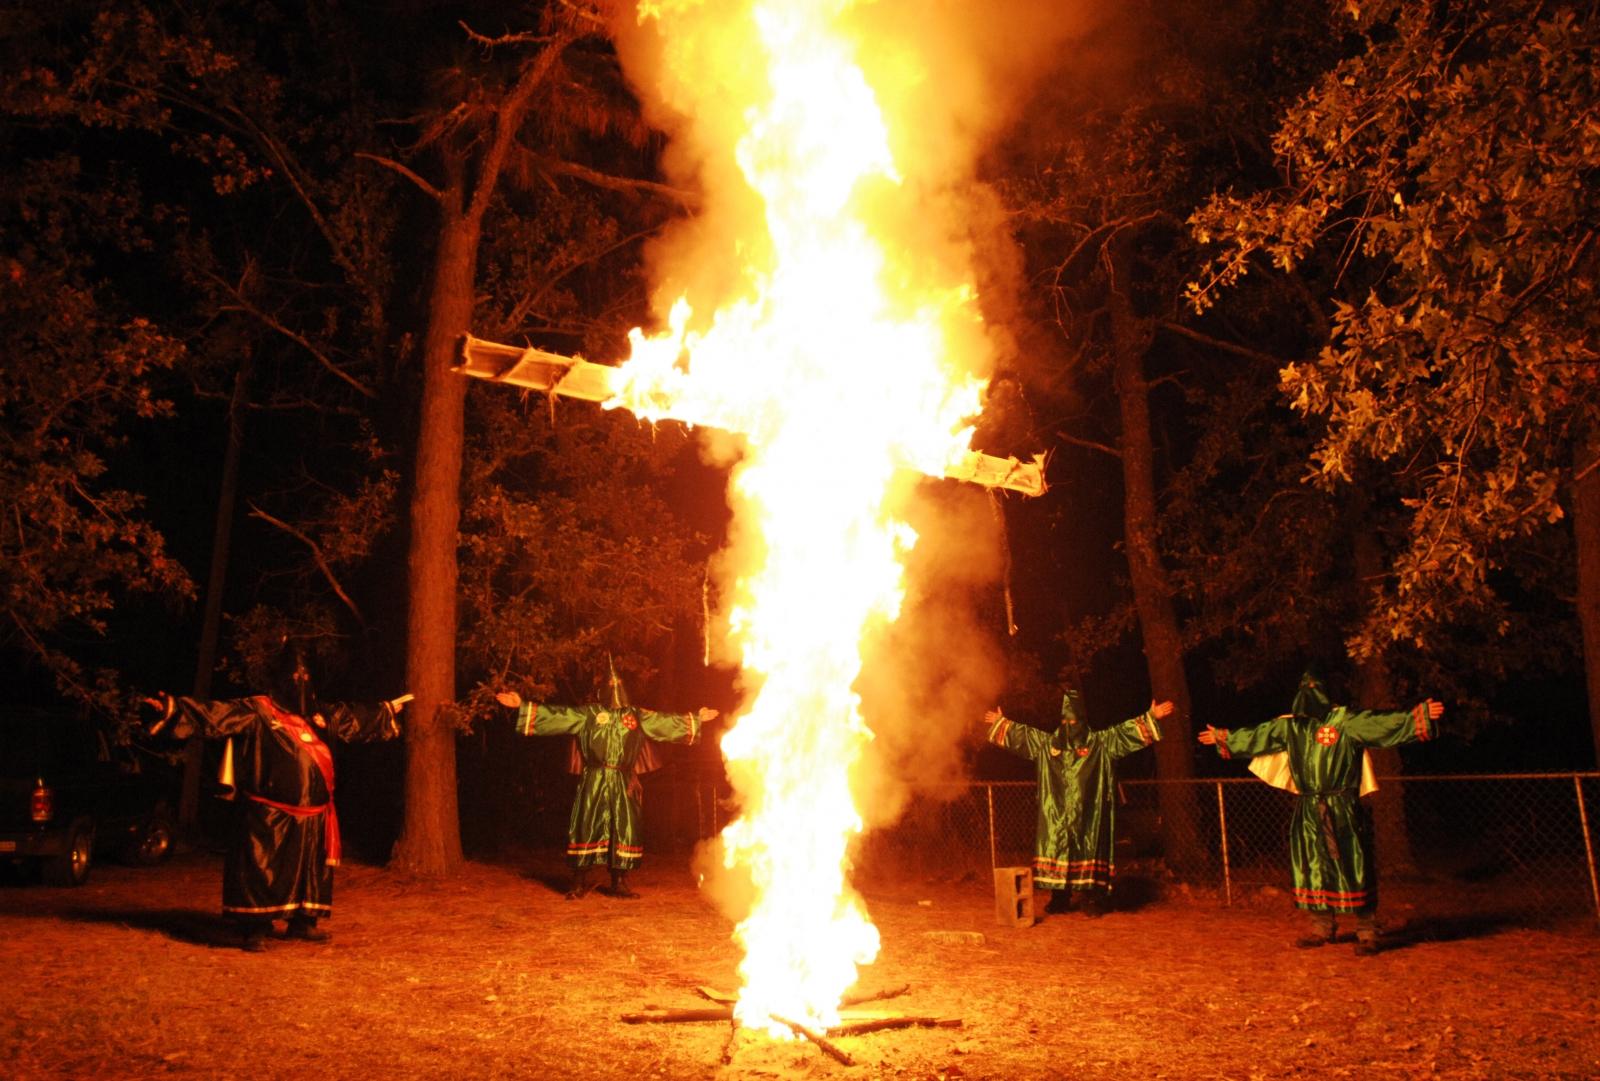 Members of the Ku Klux Klan (KKK) participate in a cross lighting ceremony at a Klansman's home in Warrenville, South Carolina